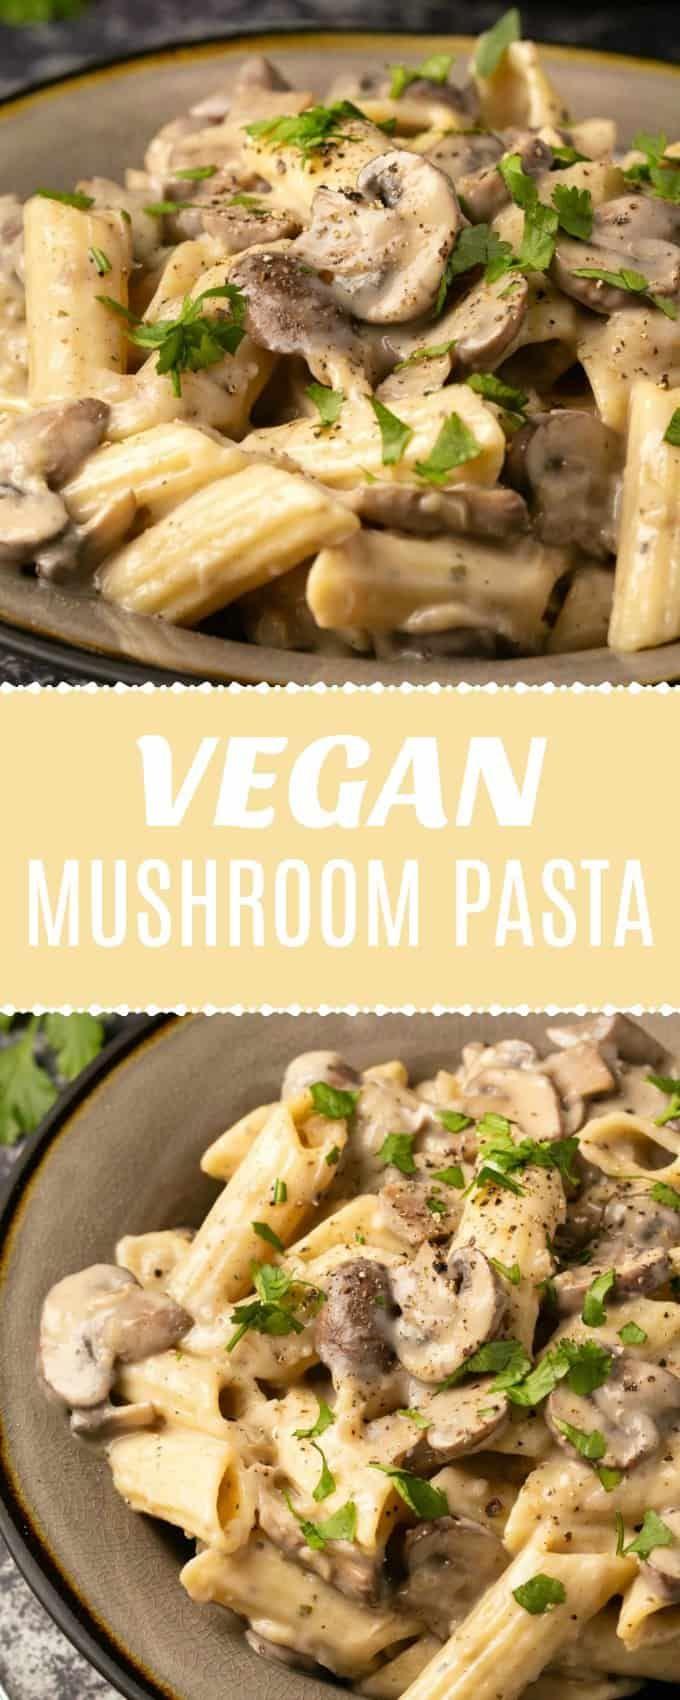 Rich And Creamy Vegan Mushroom Pasta Packed With Mushrooms